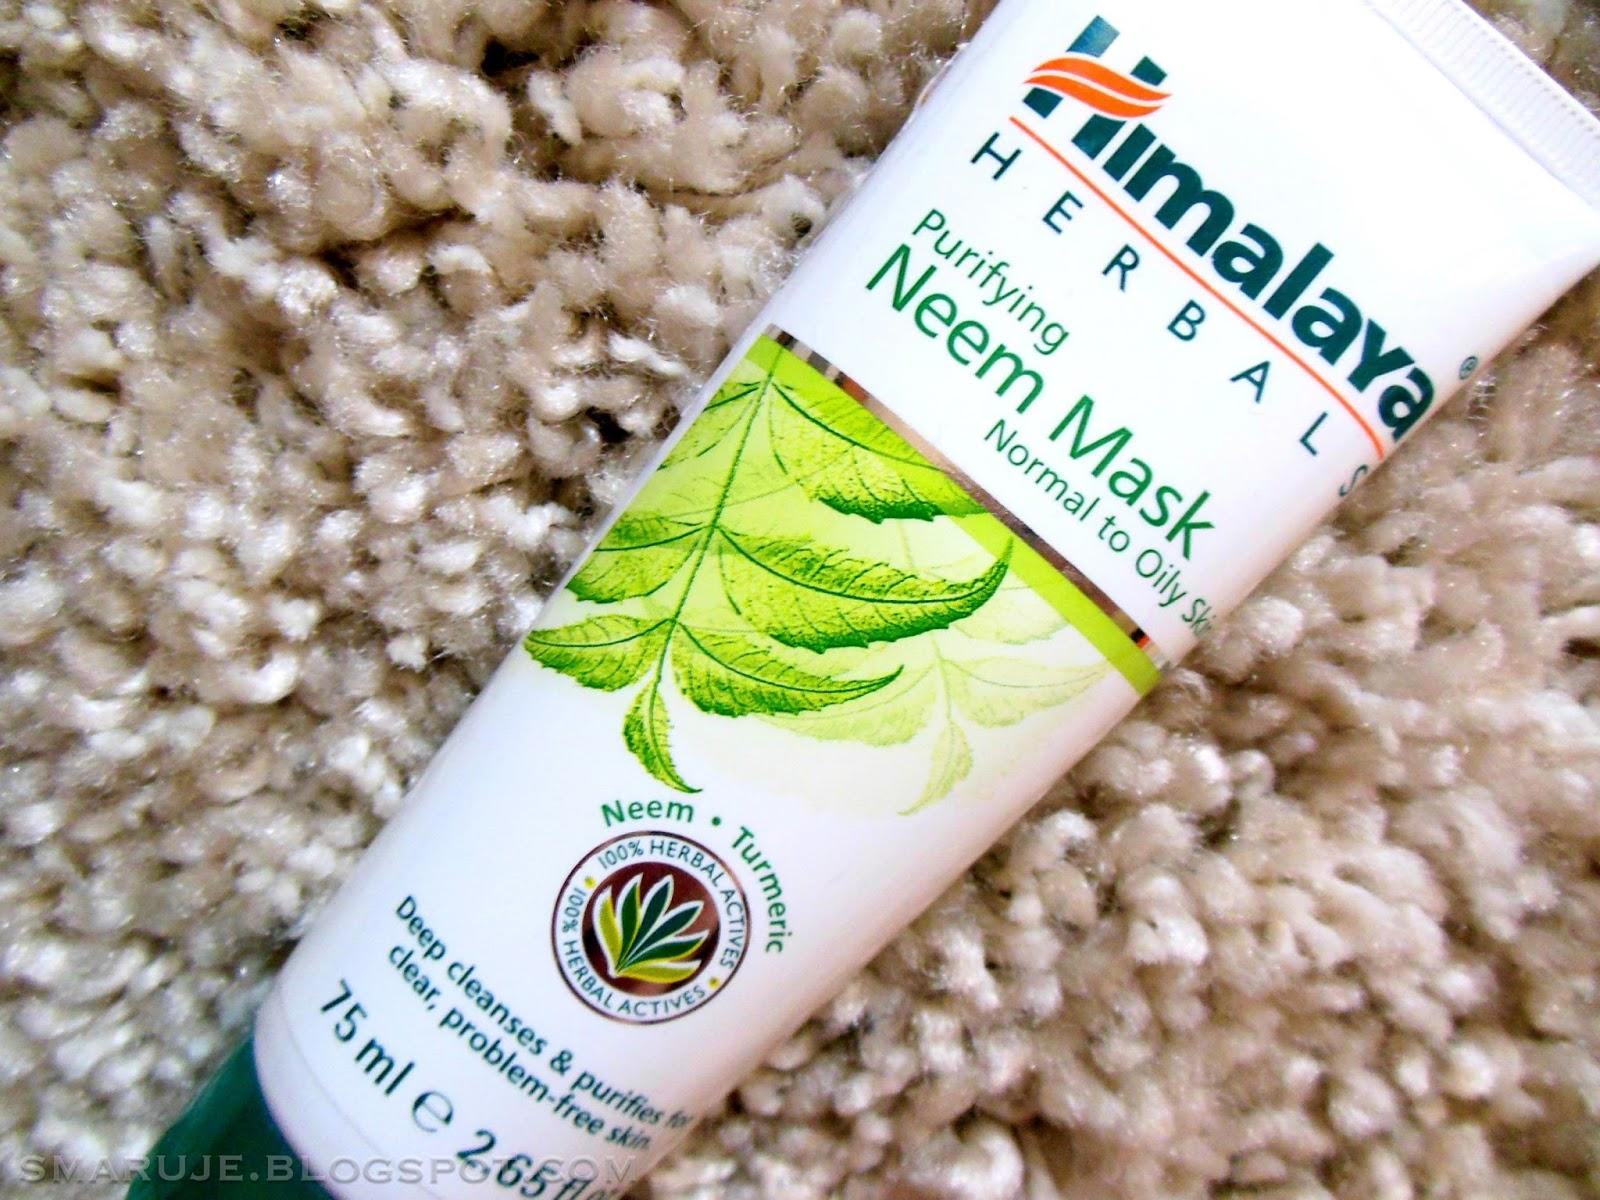 Himalaya Herbals – Purifying Neem Mask [recenzja]